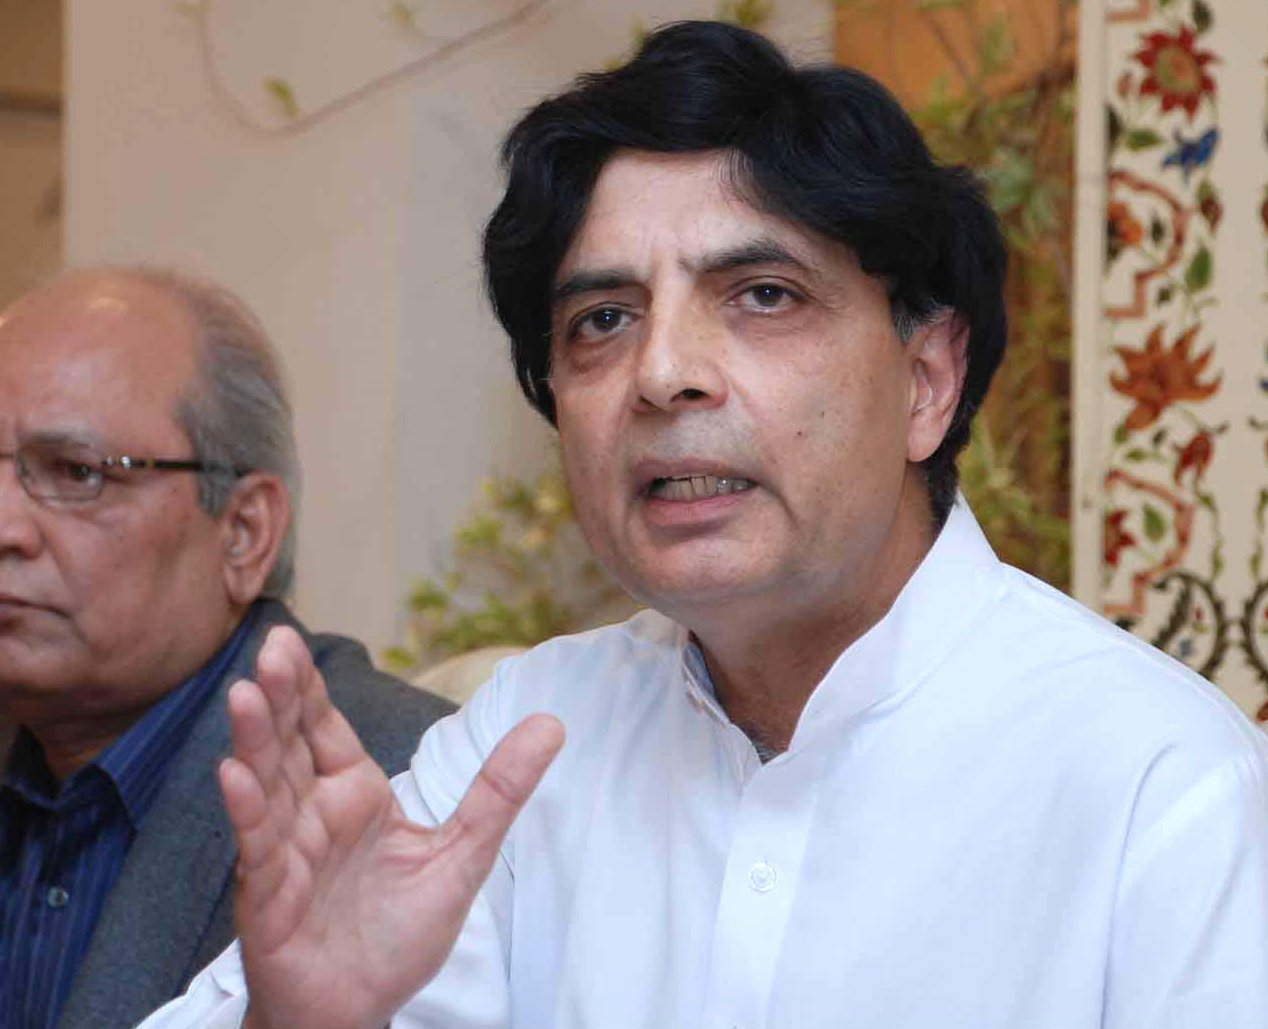 chaudhry nisar ali khan photo inp